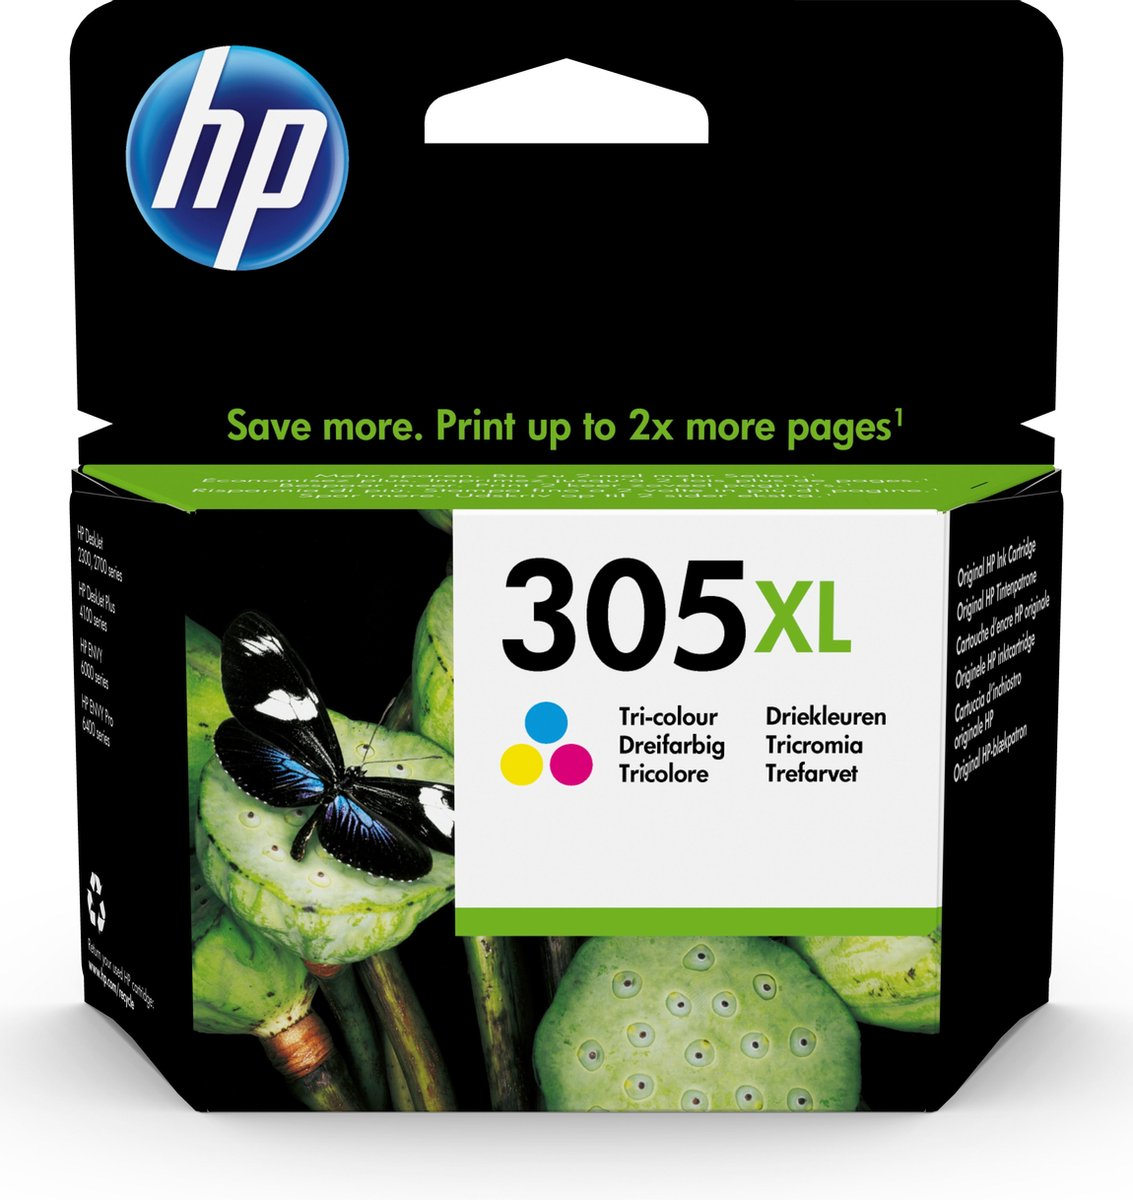 HP 305XL High Yield Tri-color Original Ink Cartridge - Drie kleuren